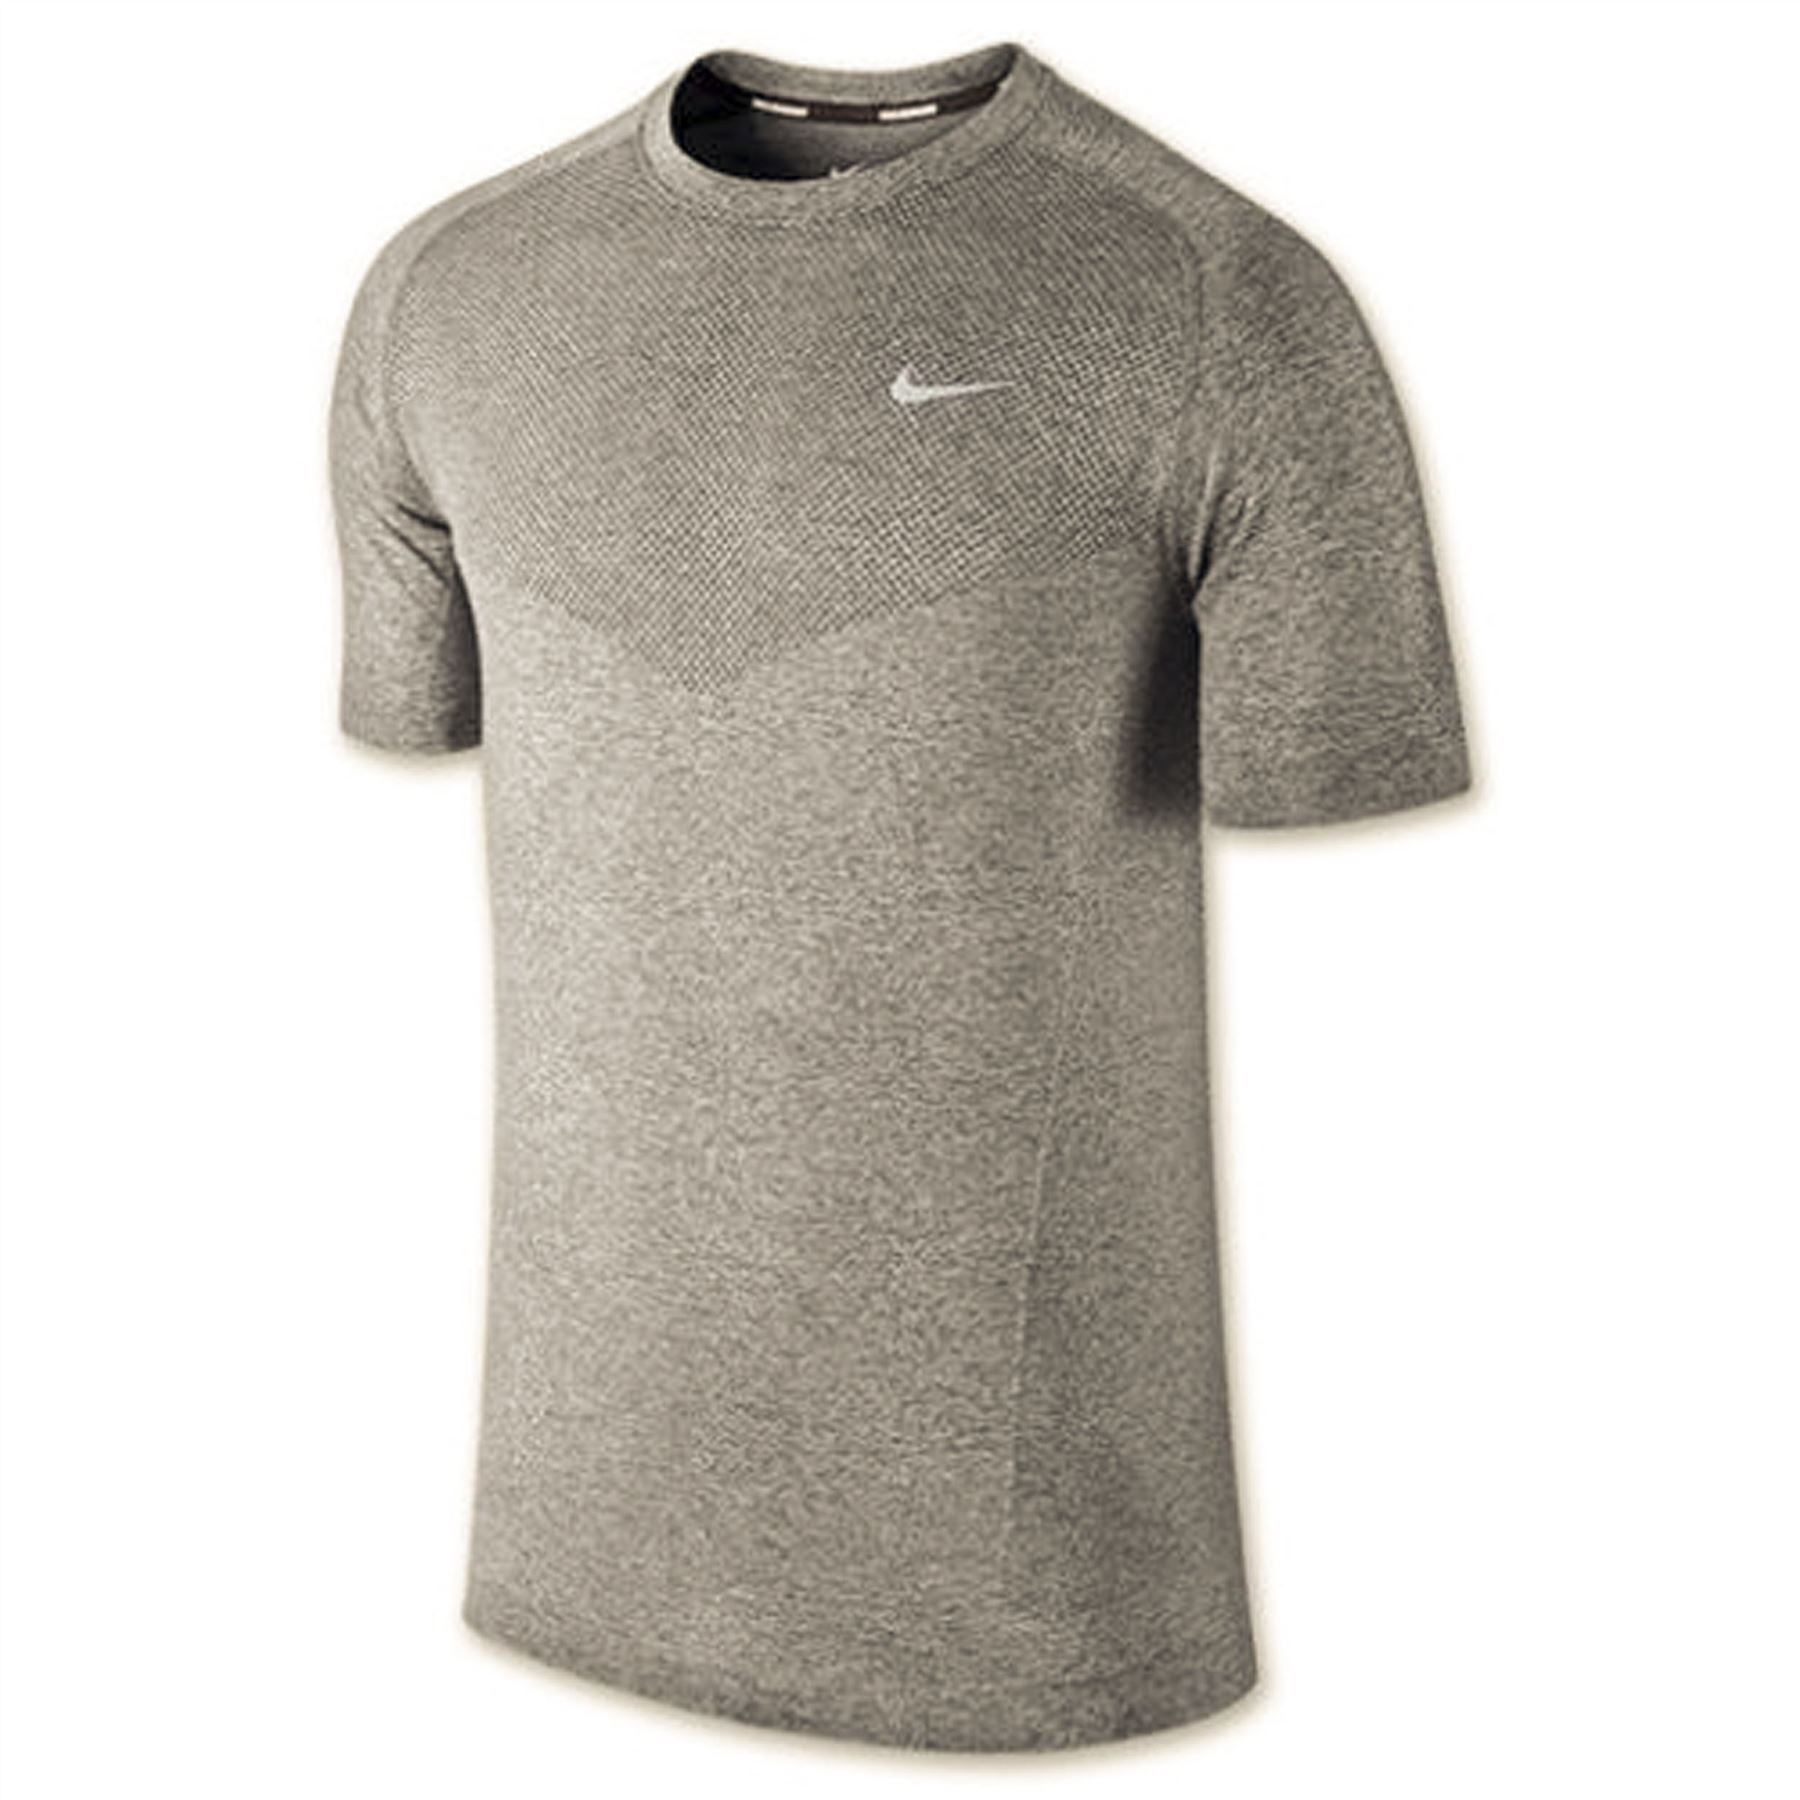 Dri Fit Shirts For Women